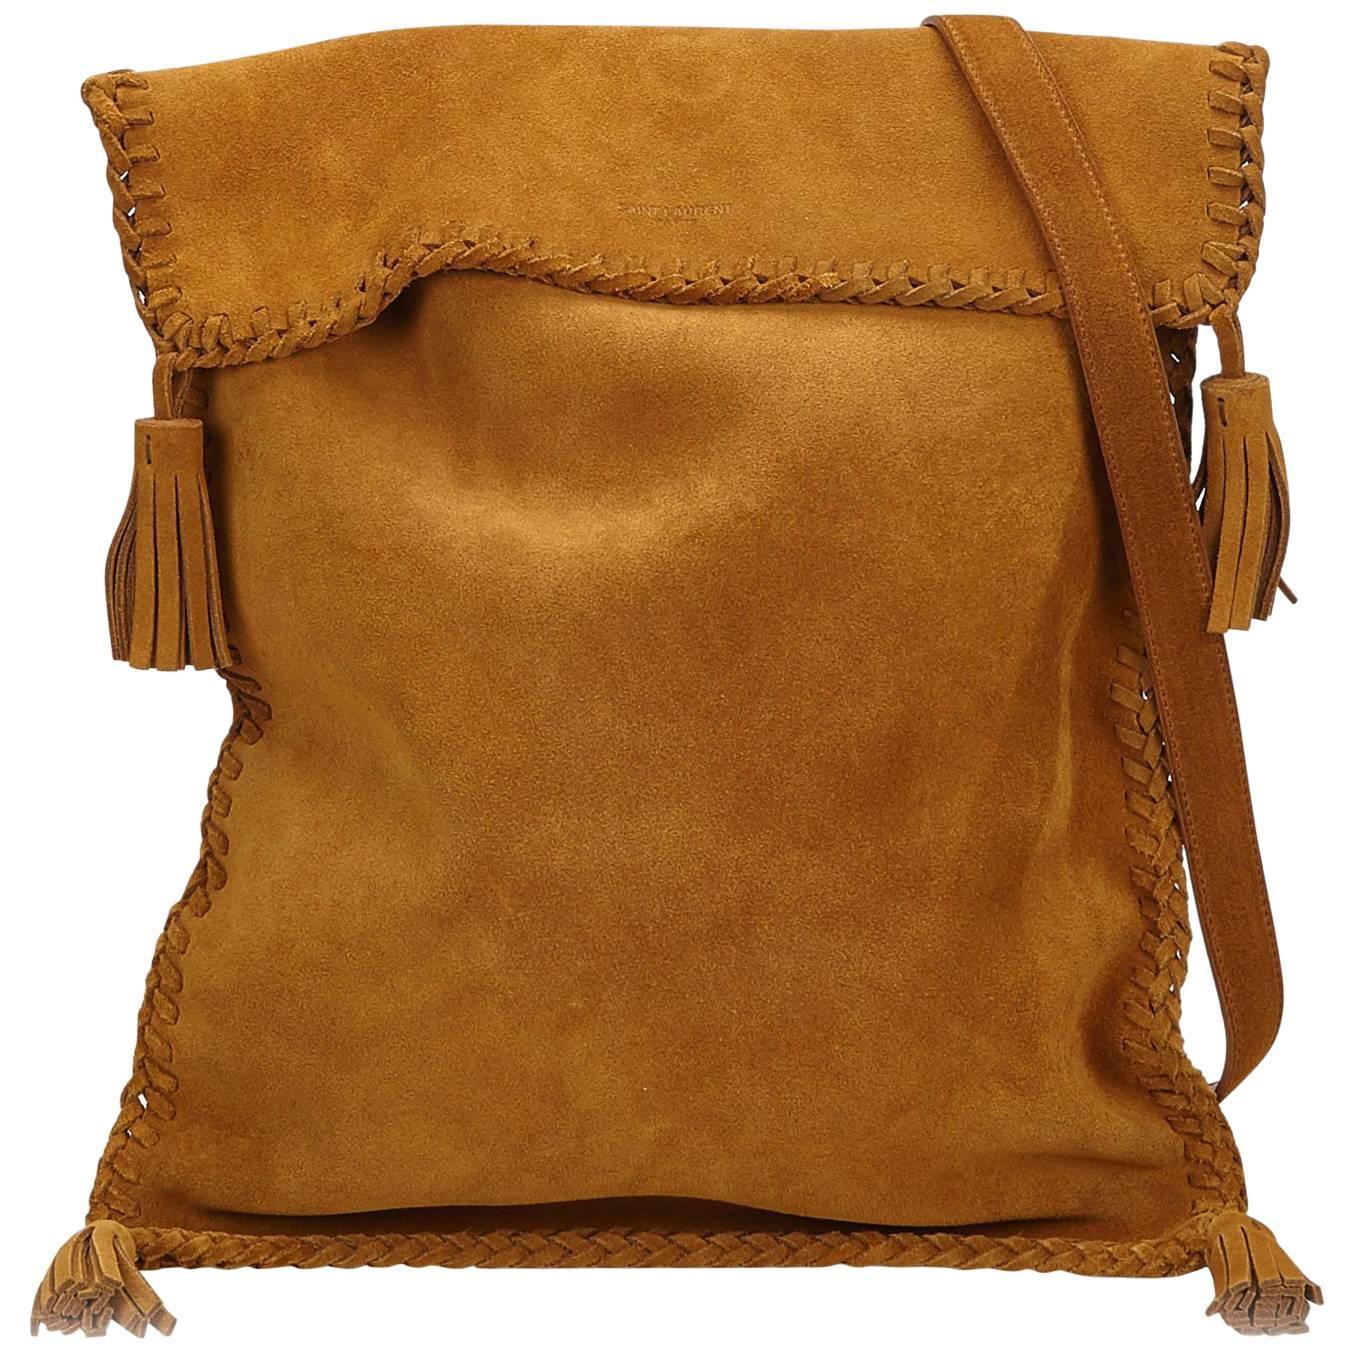 34901828e254d9 OnceStyle Handbags and Purses - 1stdibs